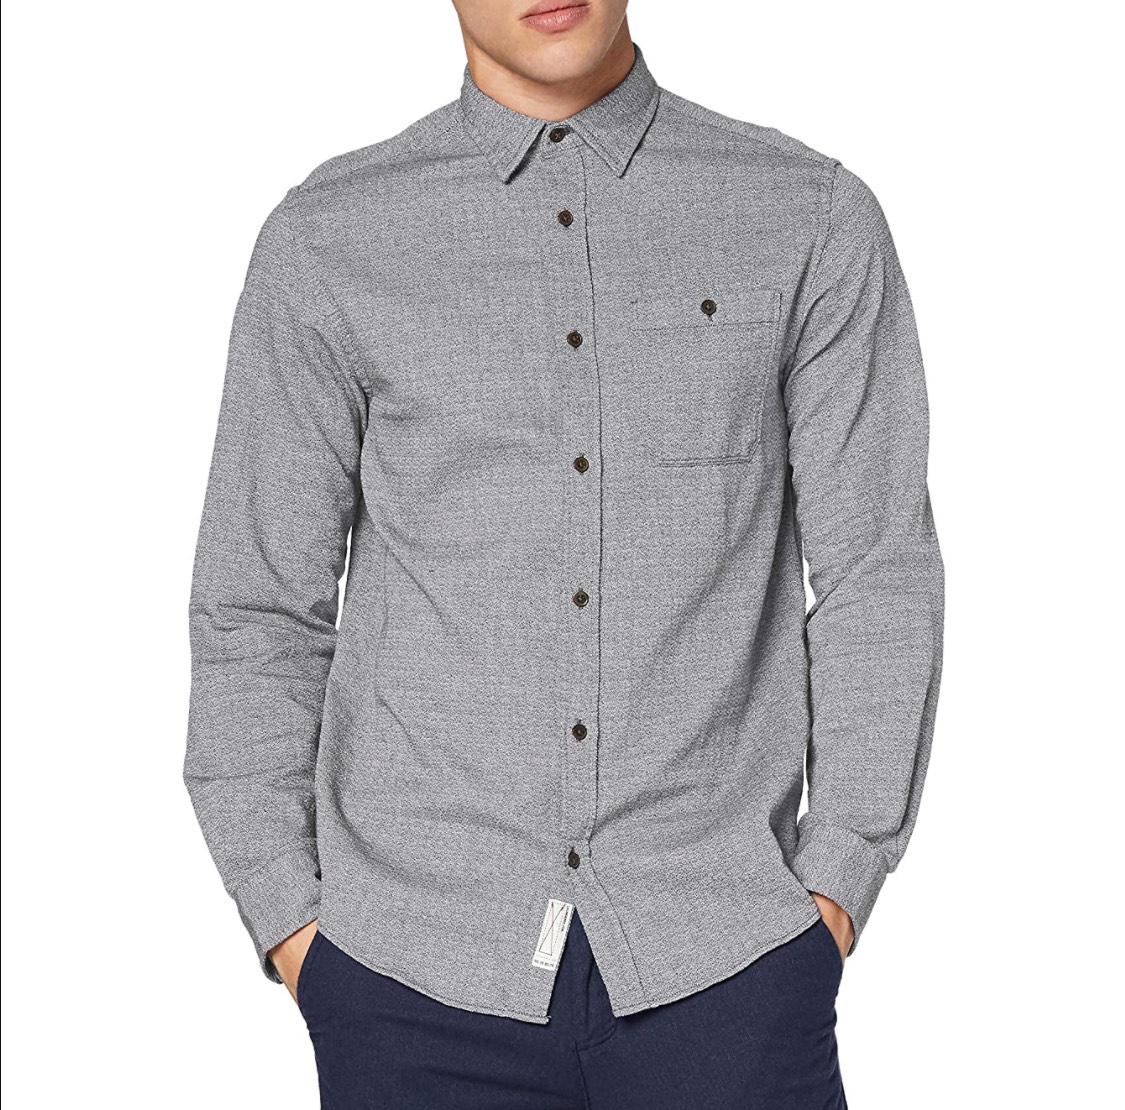 Camisa Jack & Jones adulto talla M (azul S a 7€ y azul XL a 7,41€)